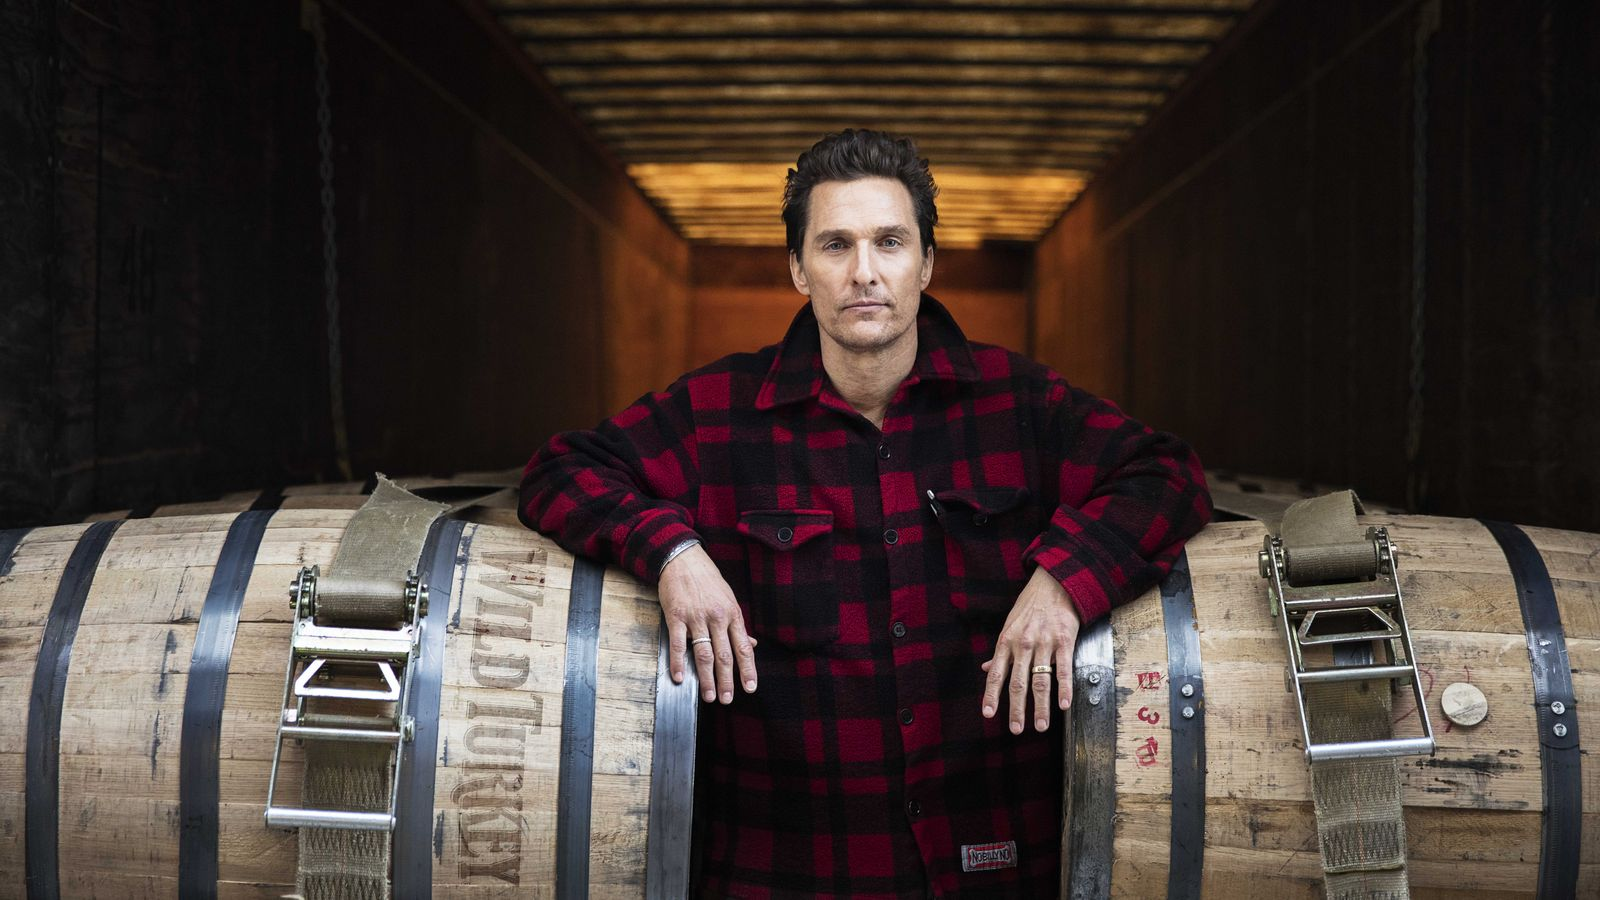 Matthew McConaughey Is the New Face of Wild Turkey Bourbon photo